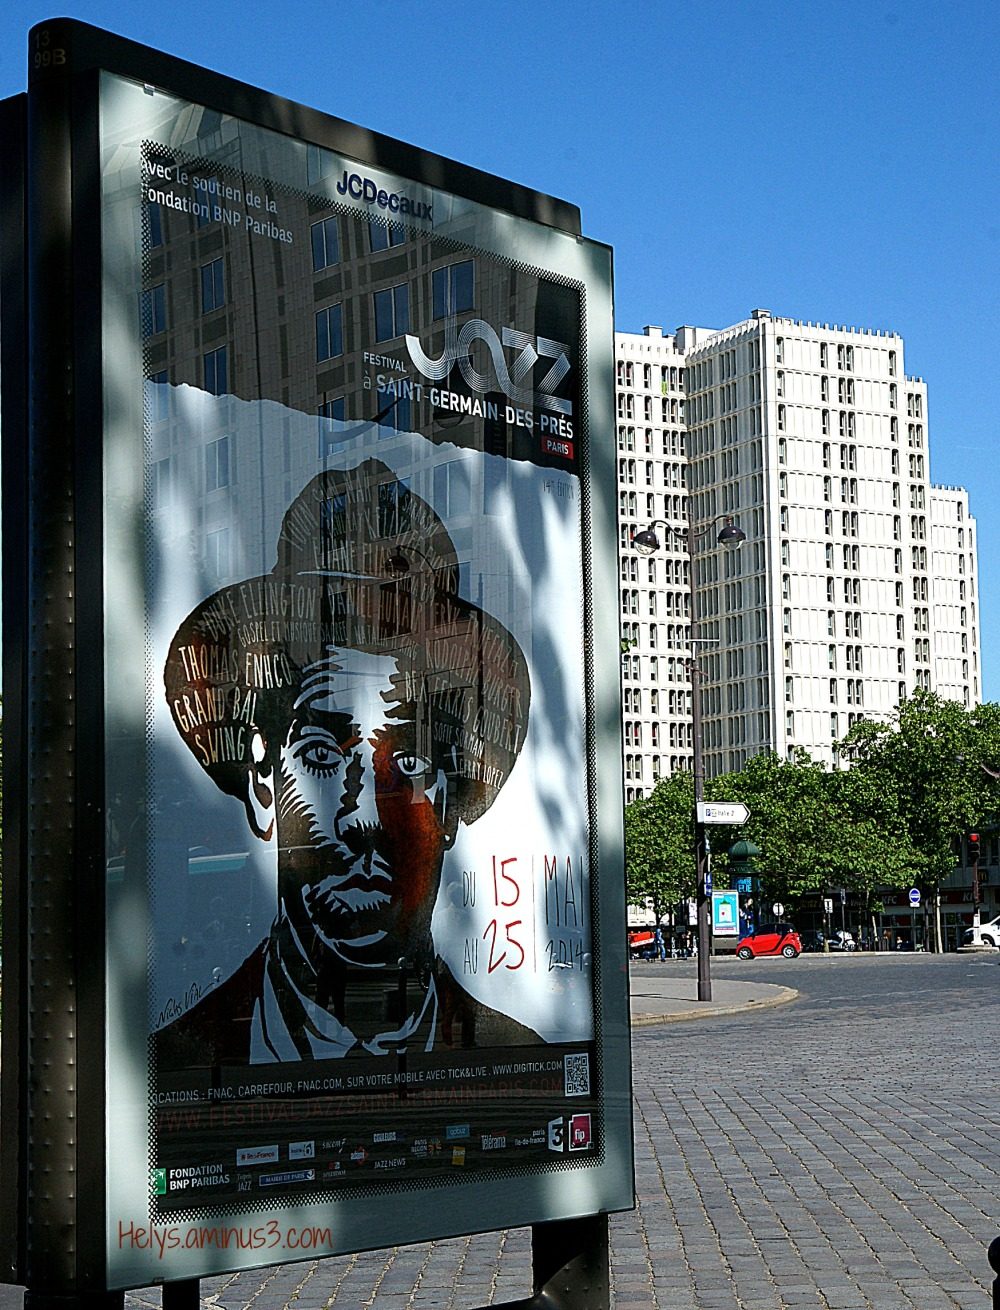 Jazz in Paris may 2014